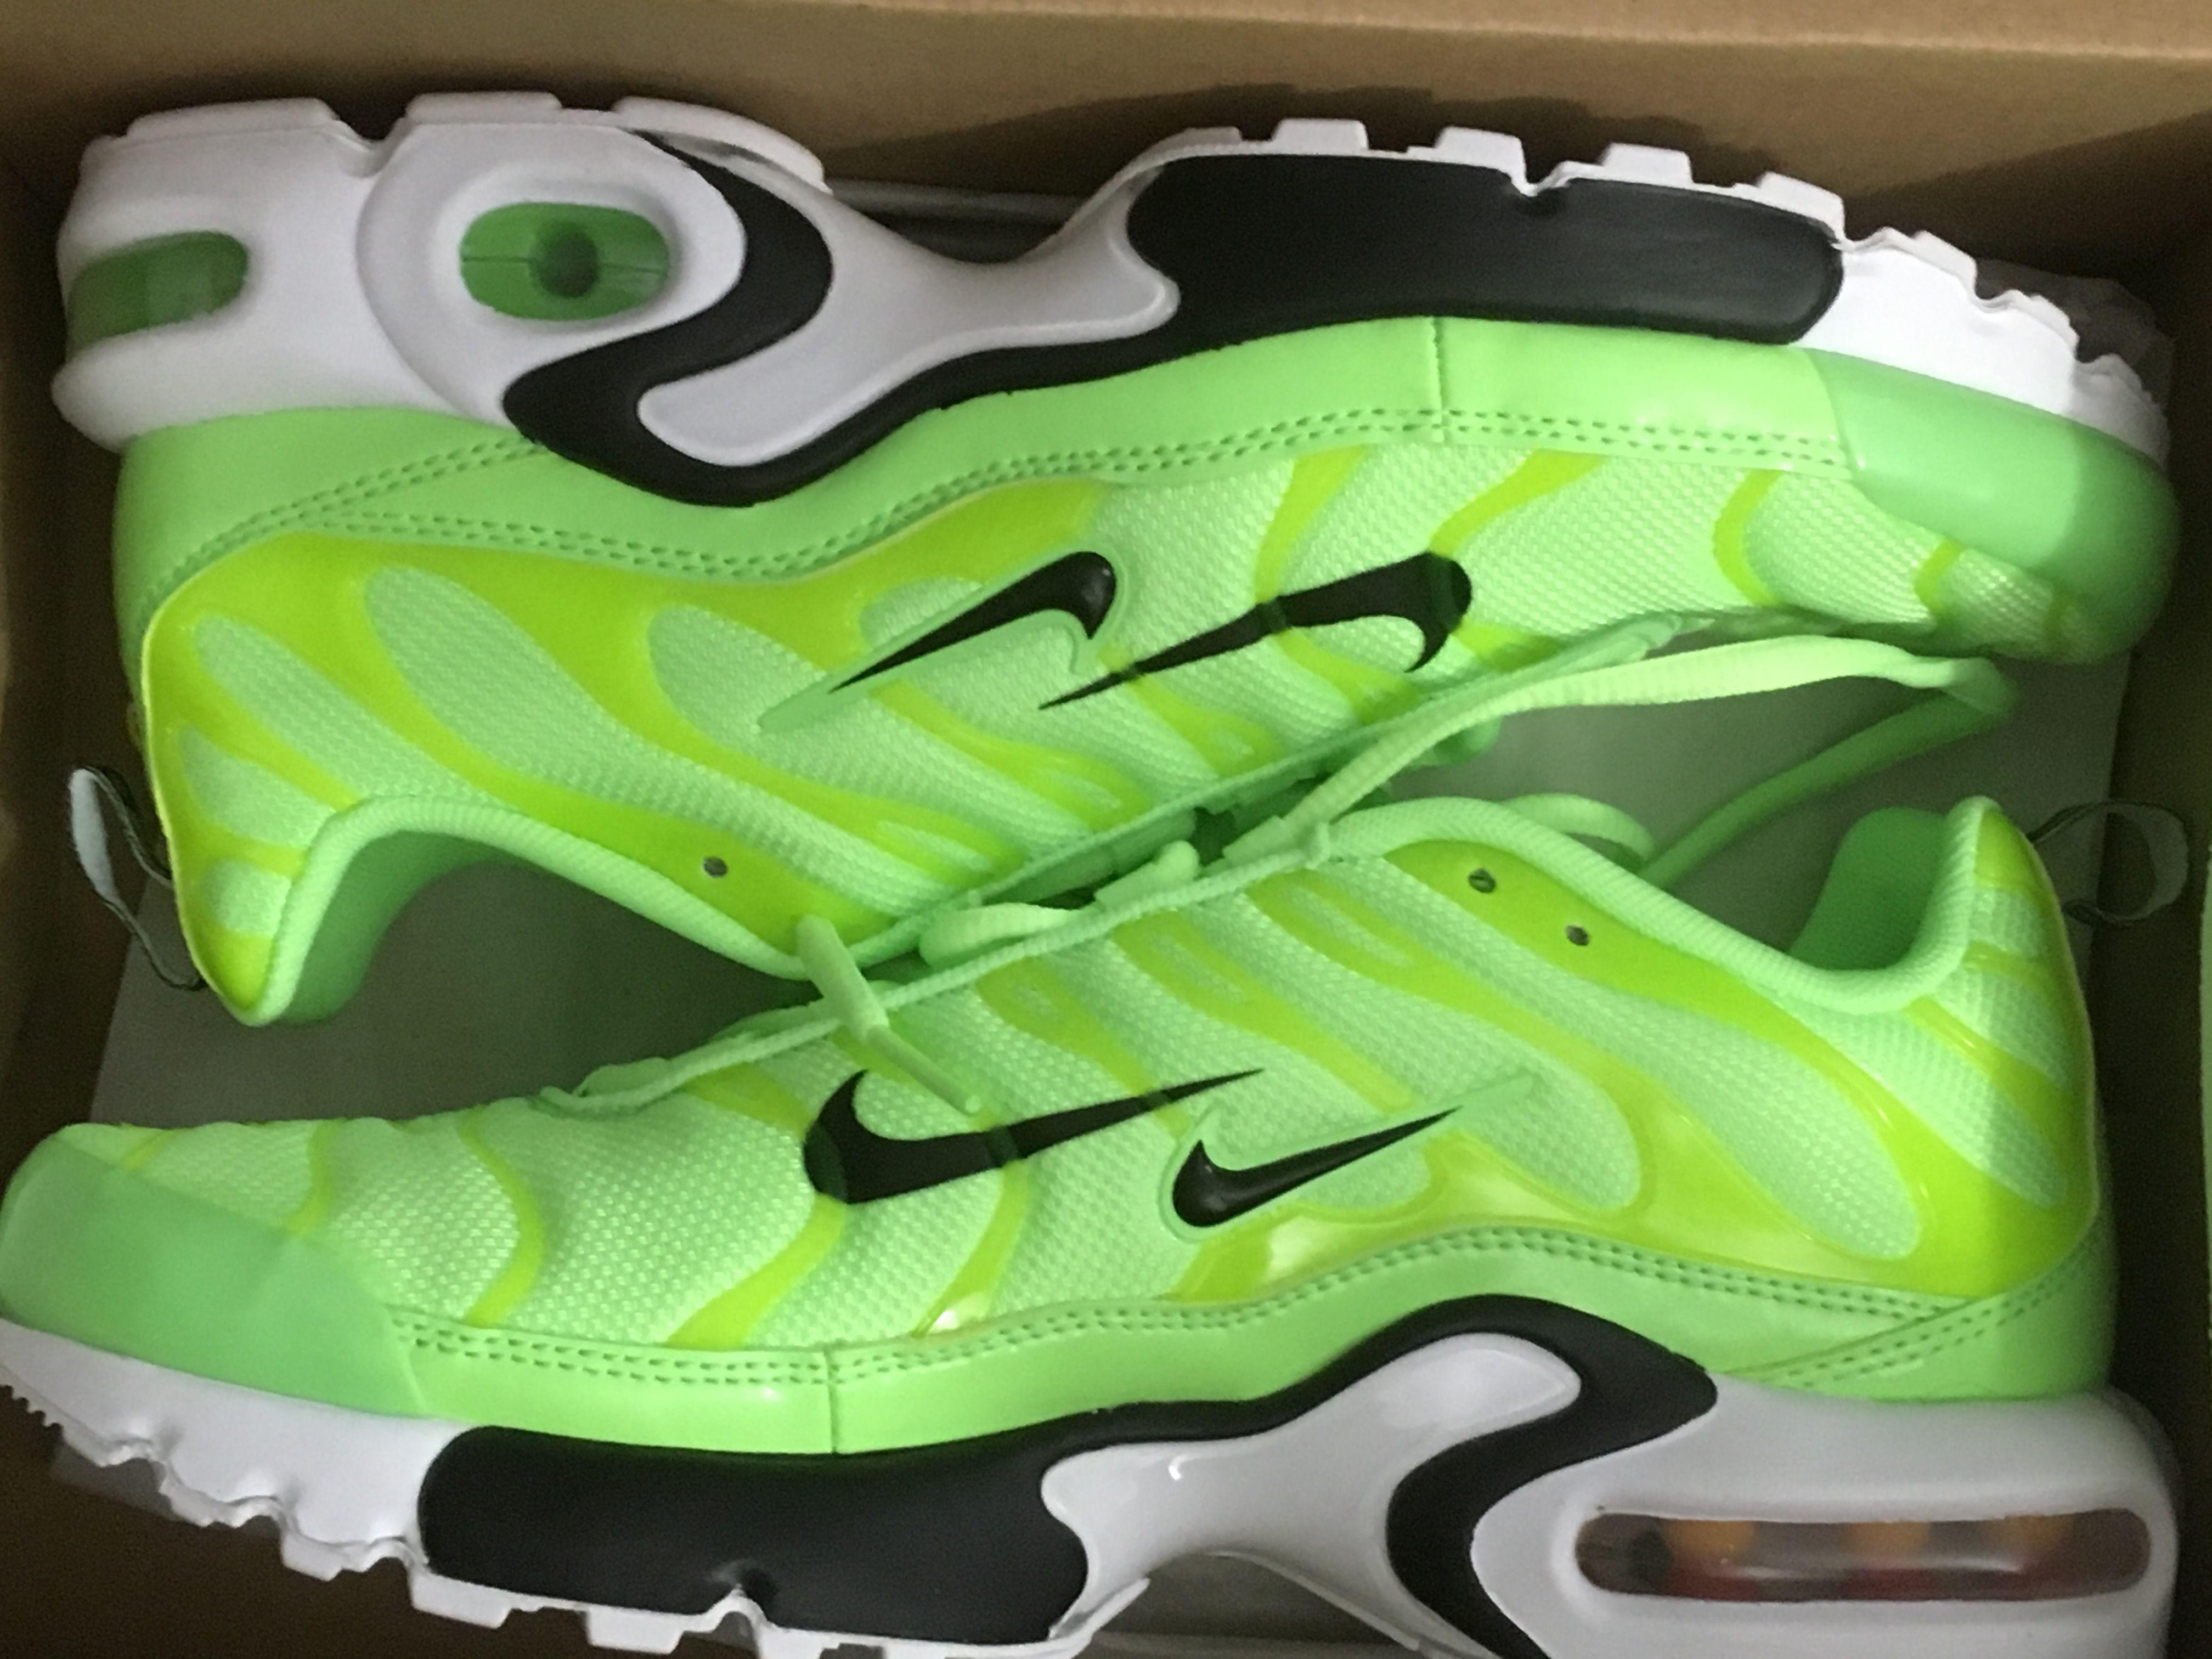 Nike Air Max Plus | Tenis shoes, Nike air max plus, Nike air max